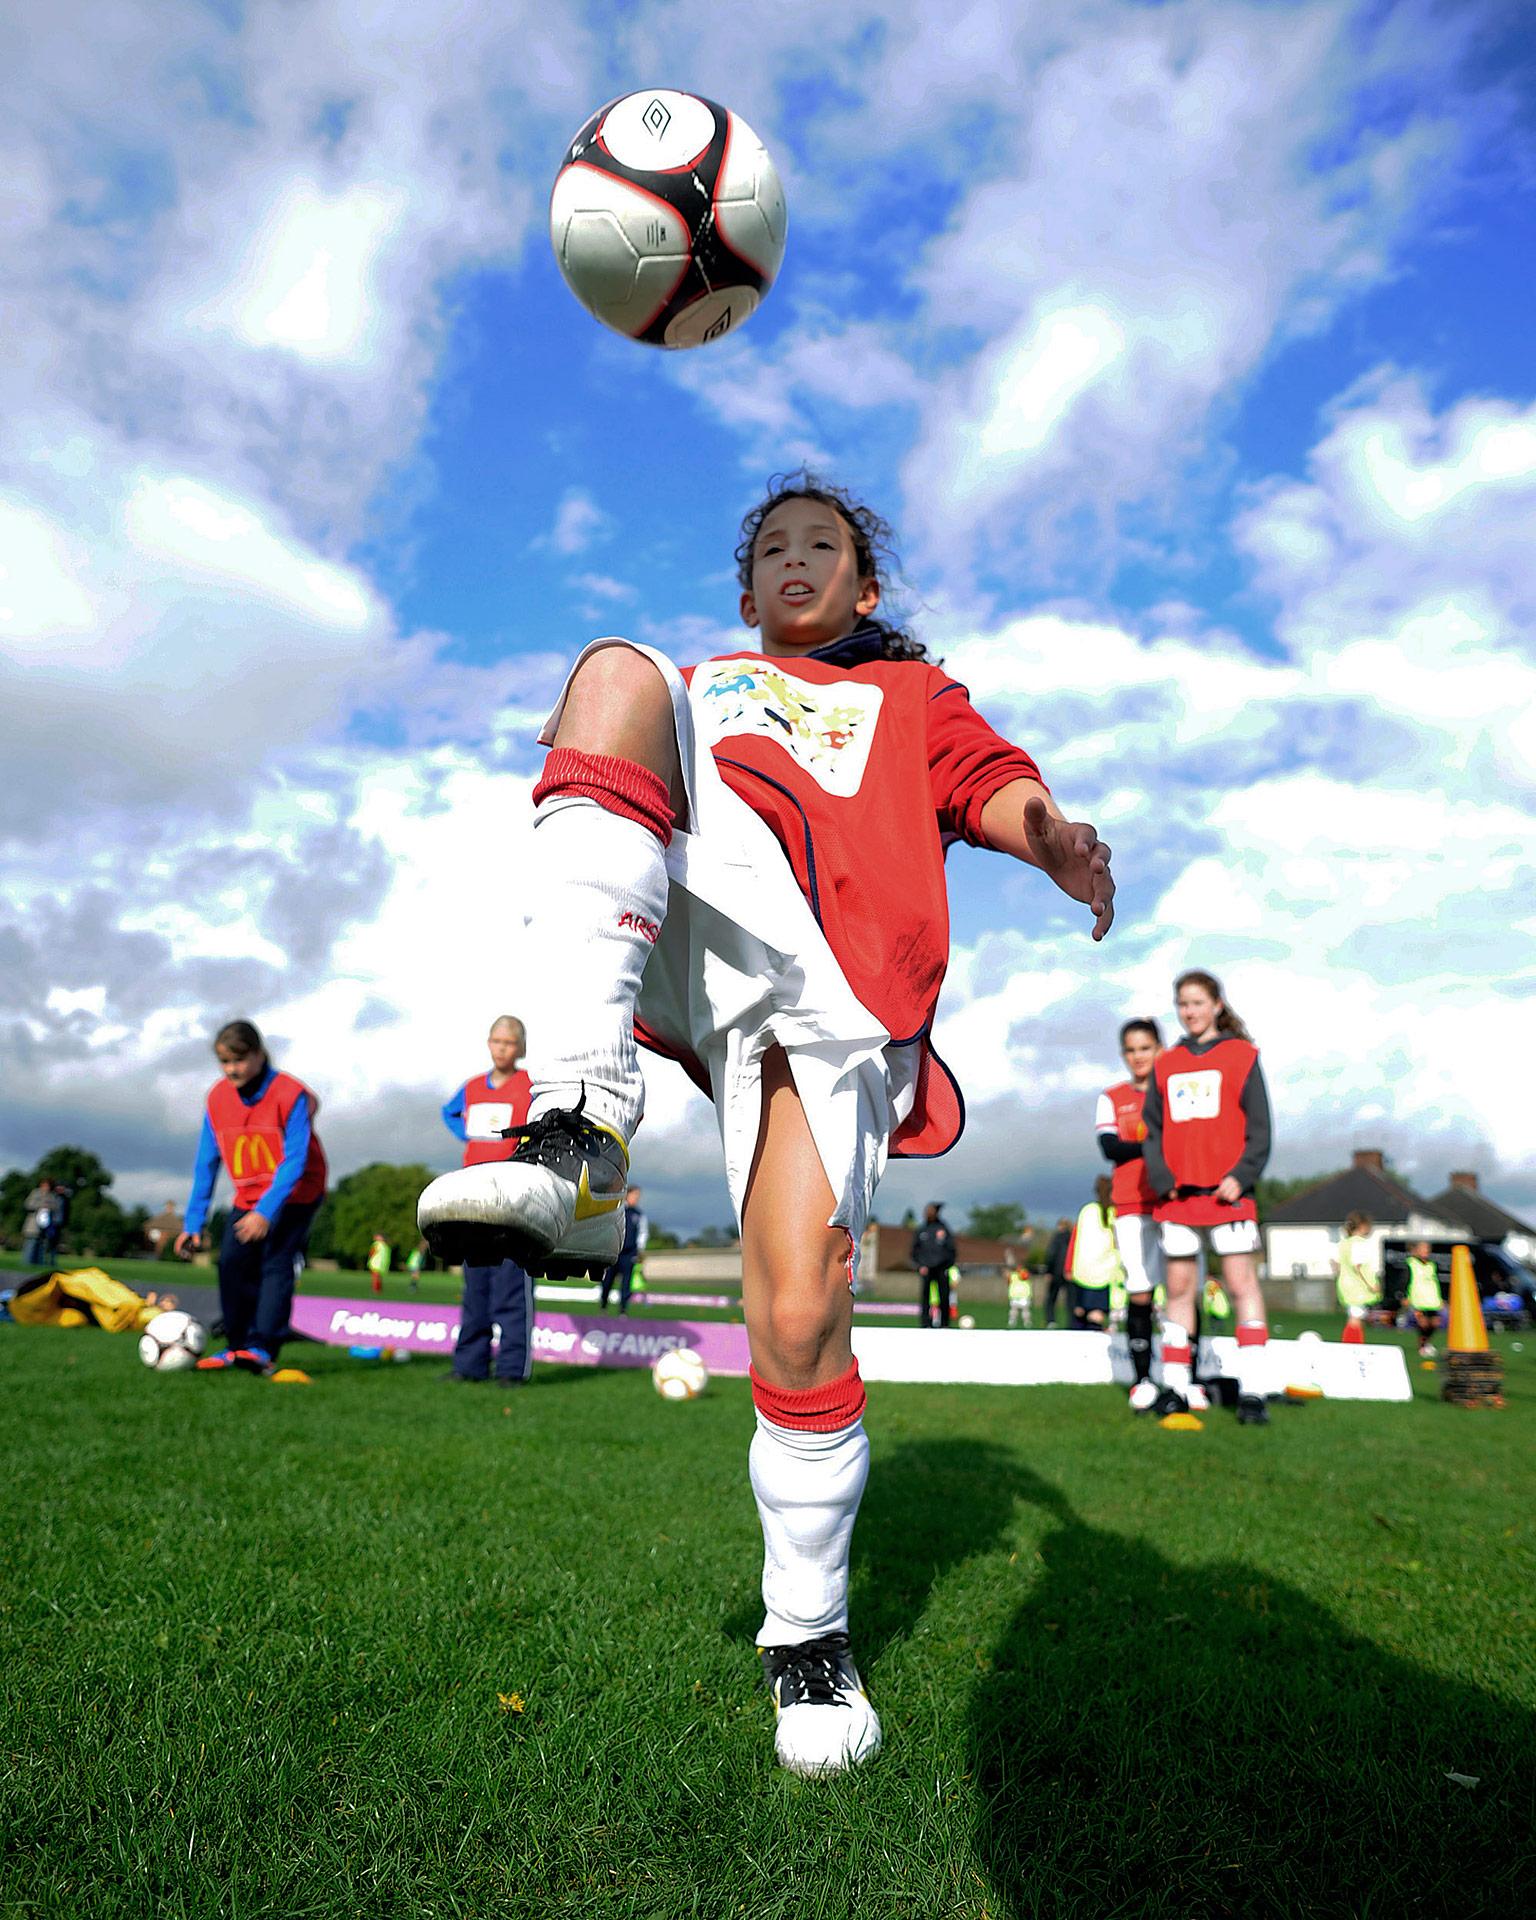 FA Girls' Football Festival